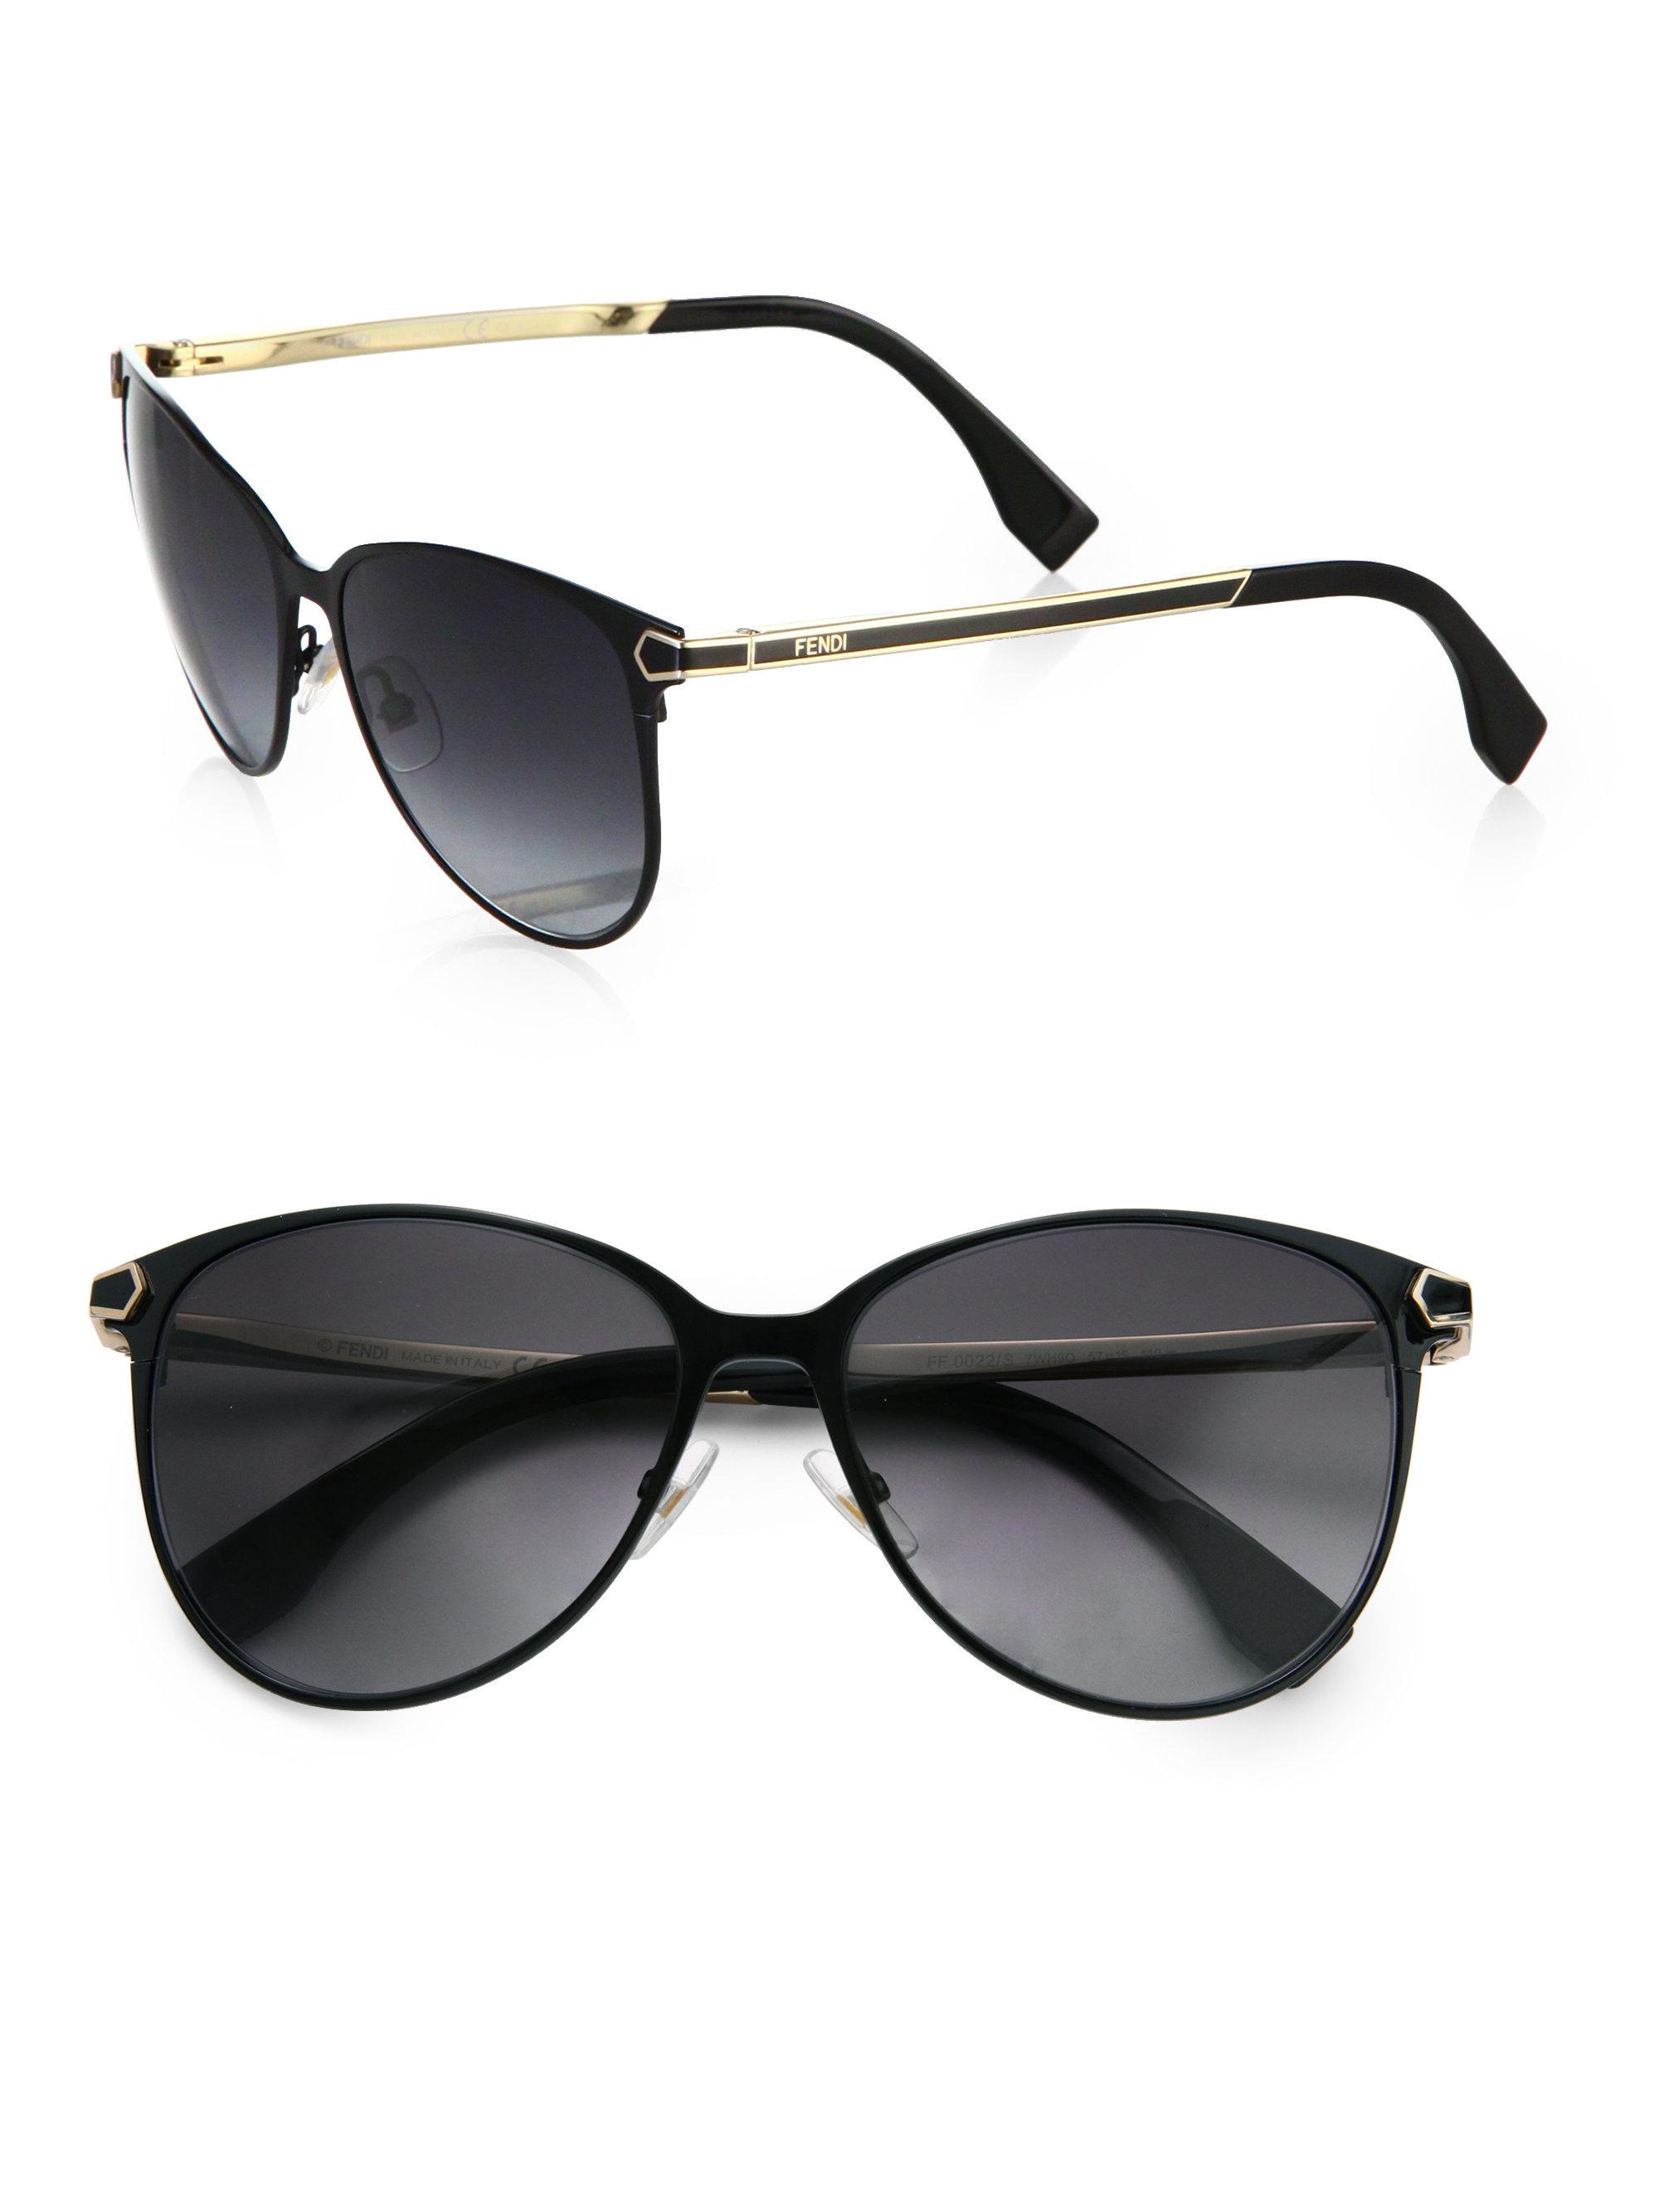 d5b9aeaccf6b Fendi 2jours Metal Catseye Sunglasses in Black - Lyst